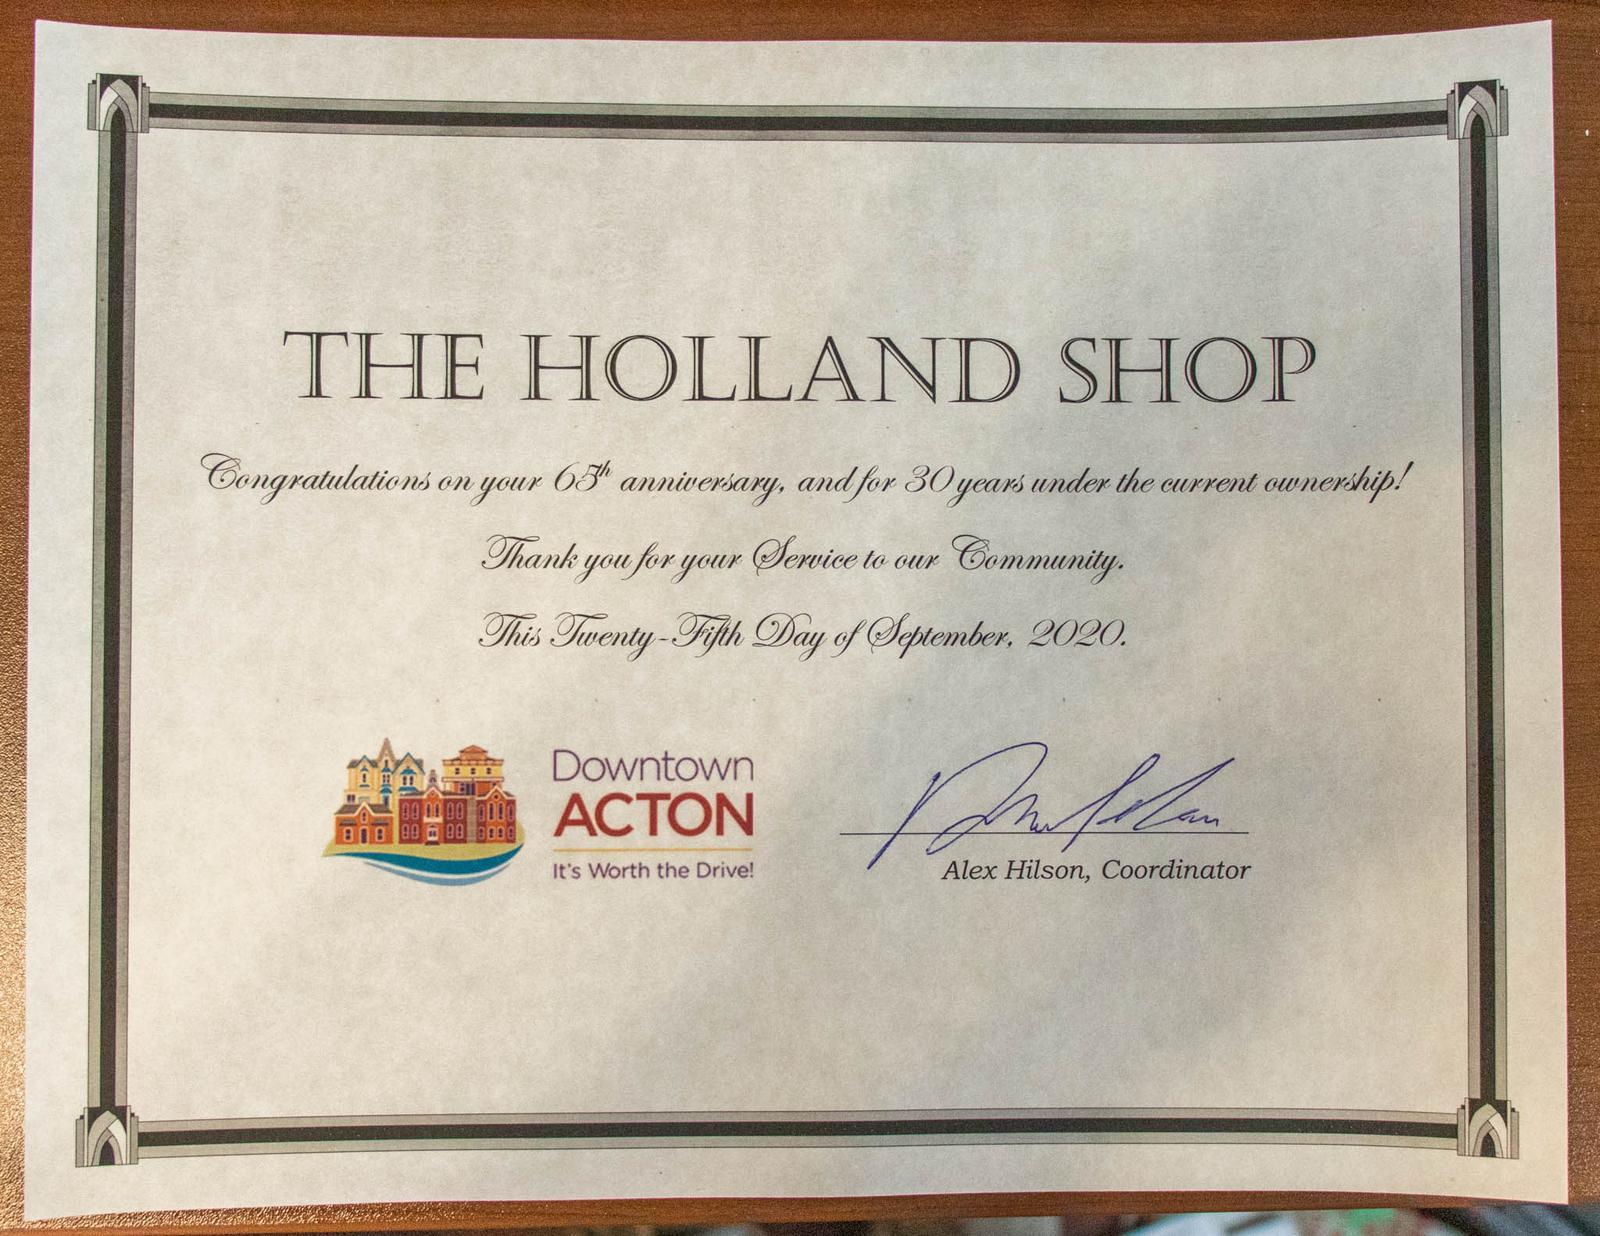 Holland Shop celebrates 65 years